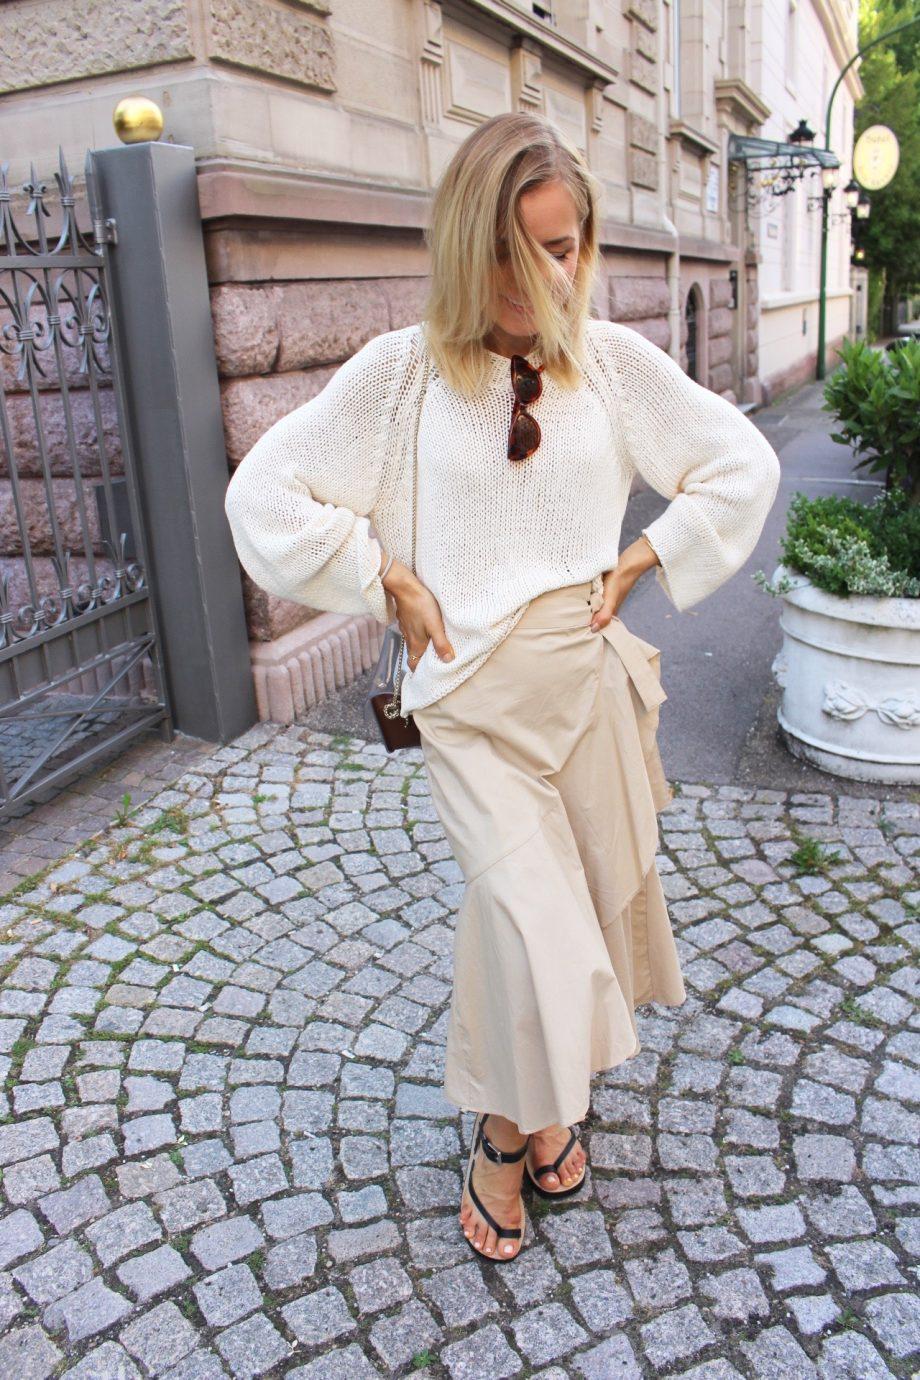 Wraparound Skirt |21.07.2017